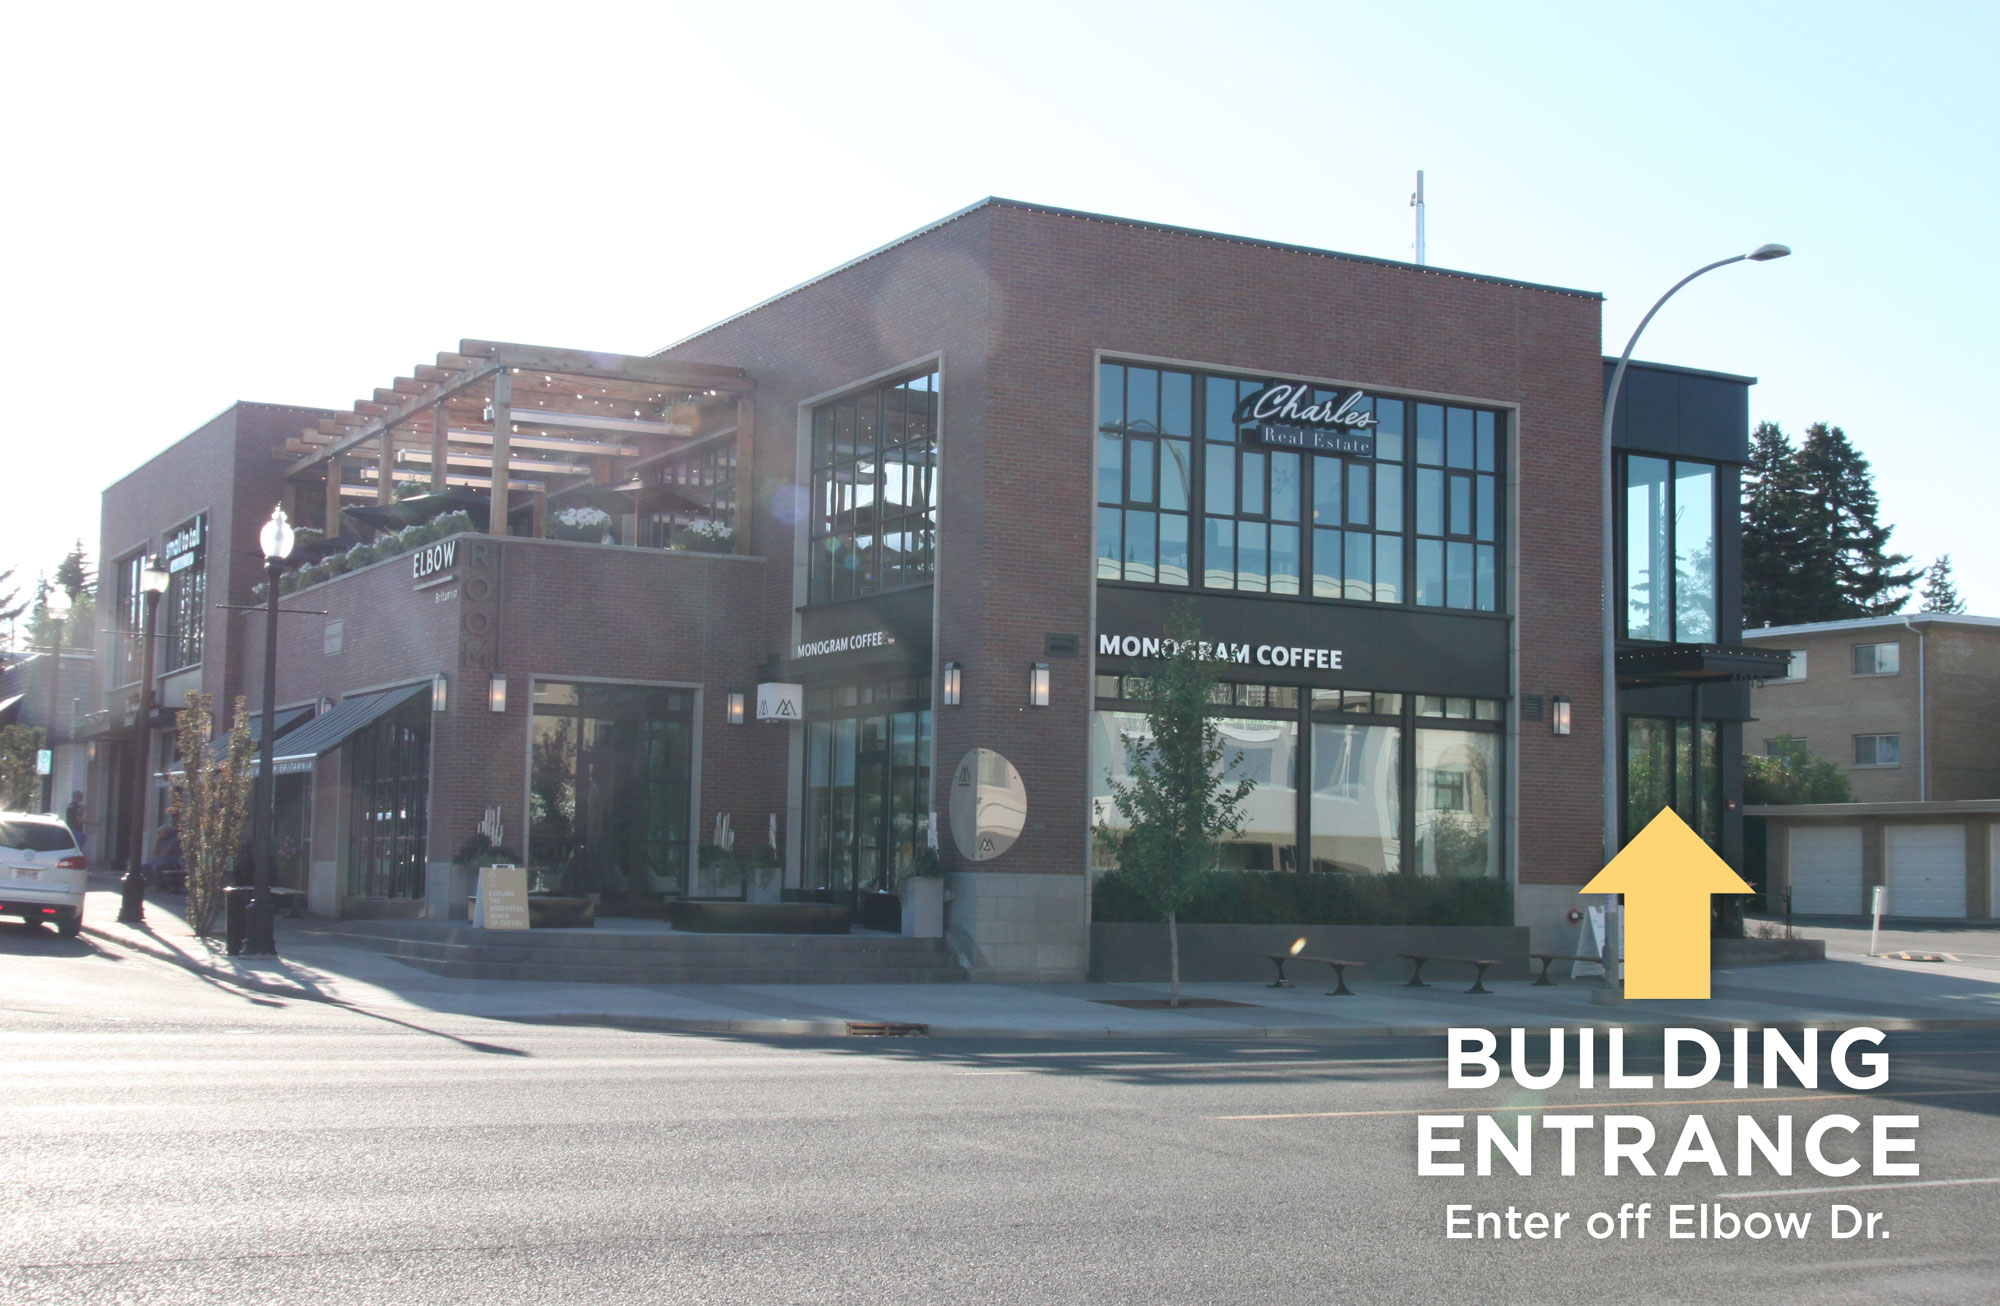 building-entrance-2.jpg